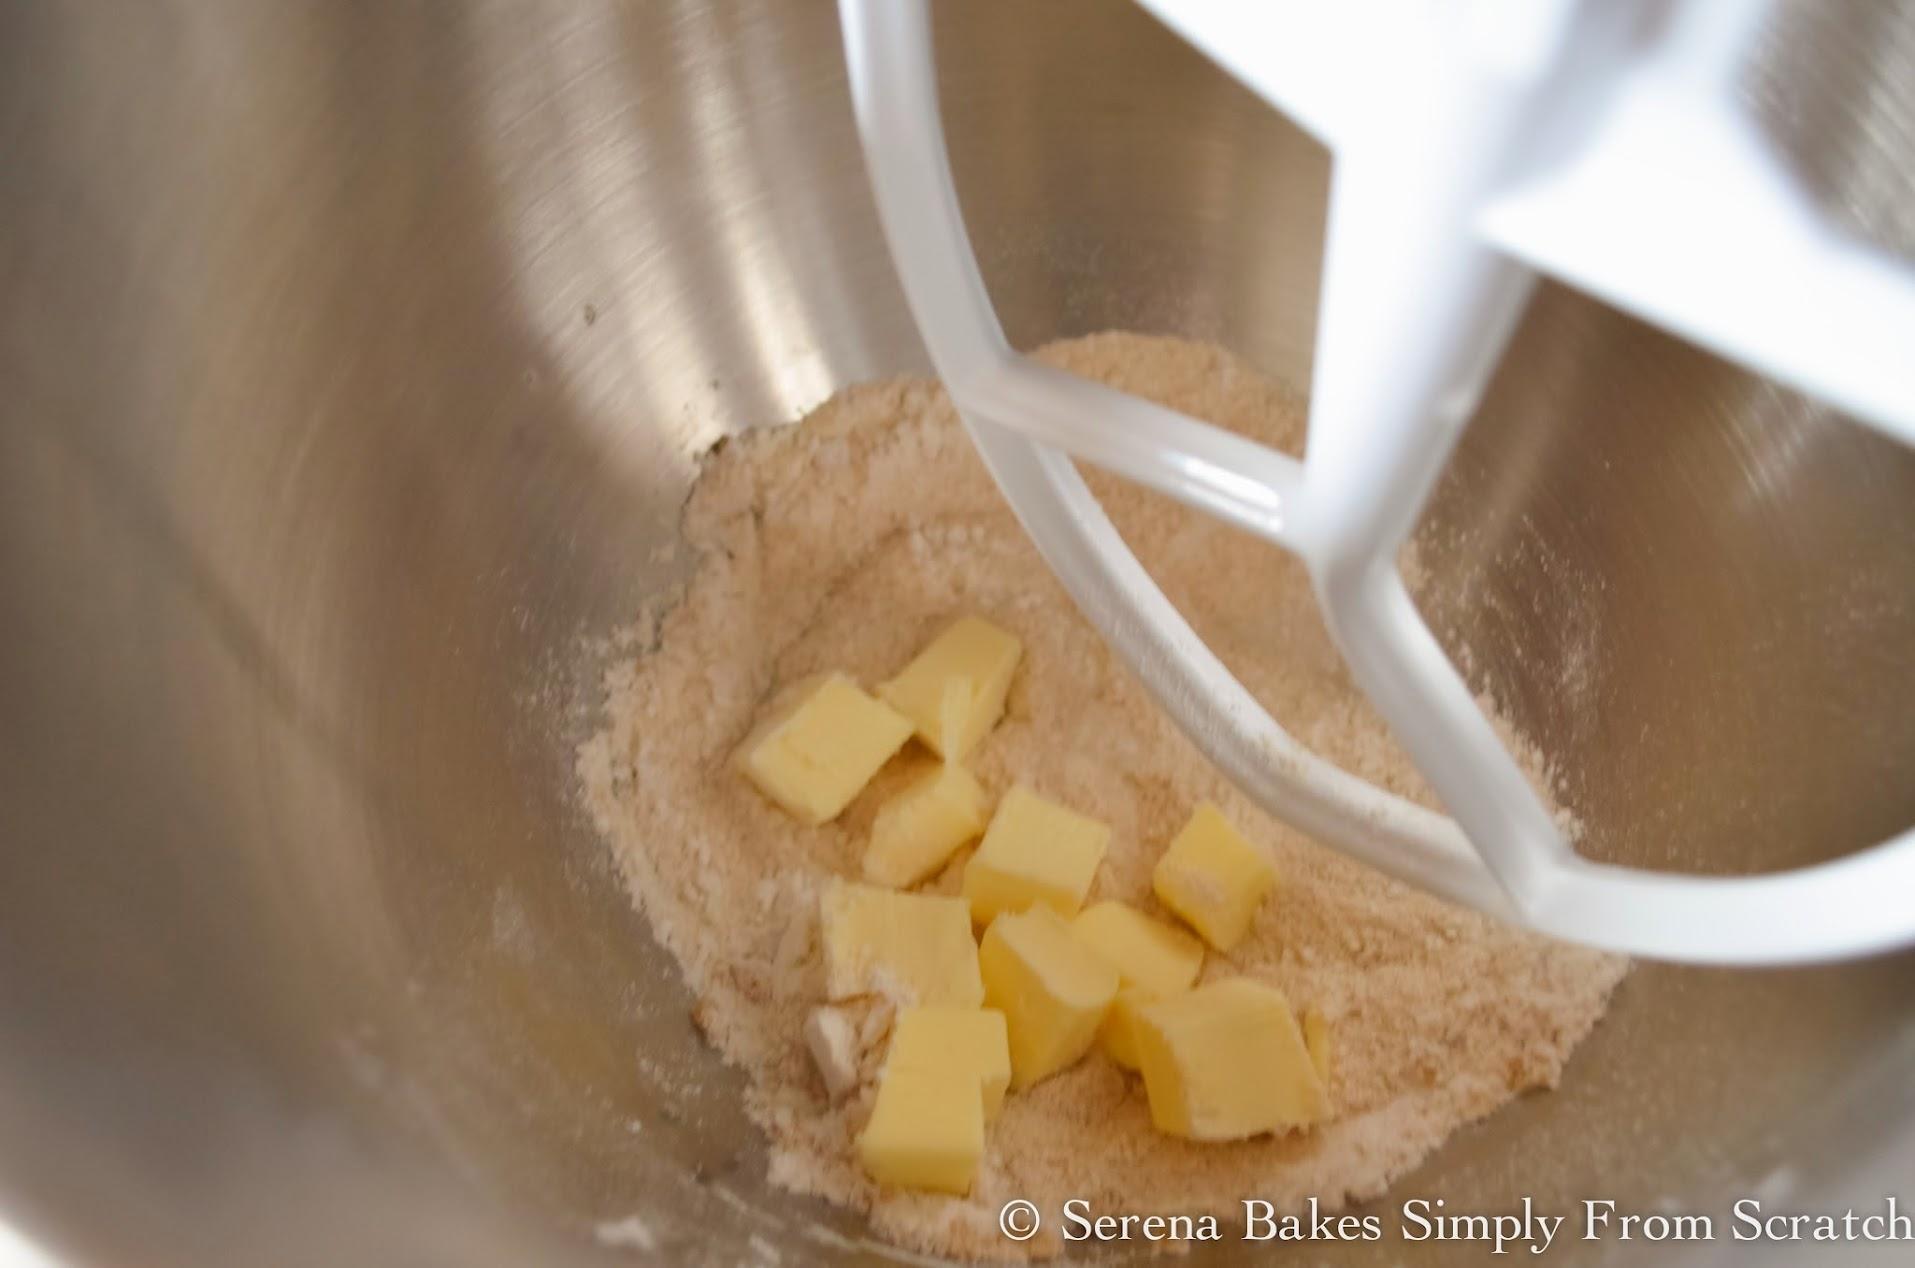 Orange-Cranberry-Bread-With-Orange-Glaze-Streusel-Brown-Sugar-Cinnamon